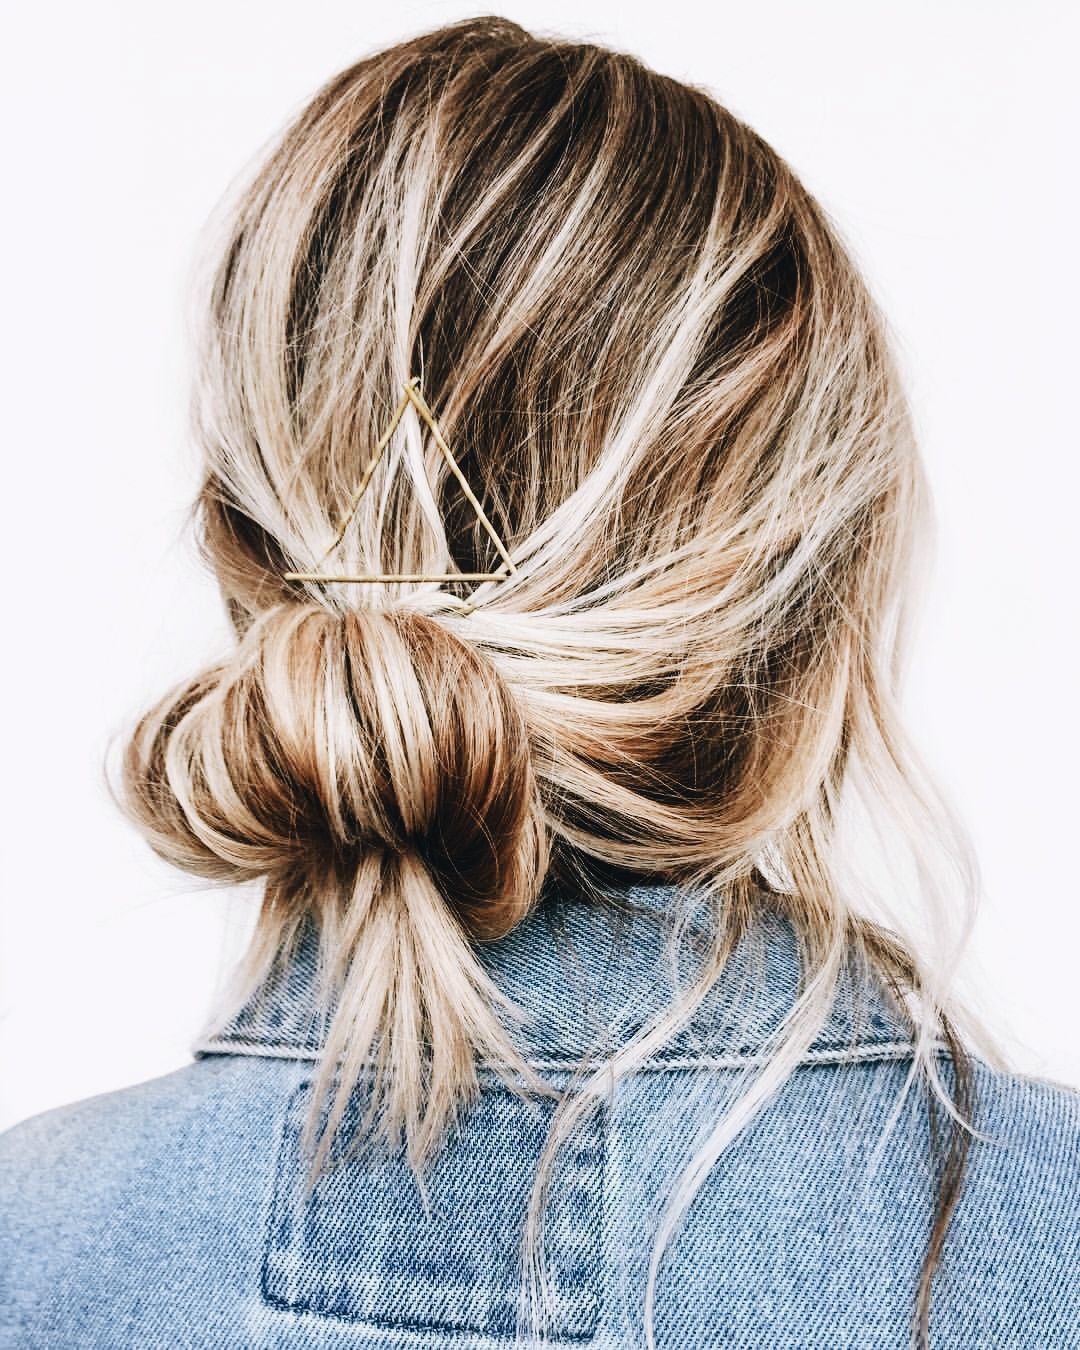 Low Messy Bun Style Hair Blonde Hair Easy Long Hair Idea Ideas Inspiration Highligh Blonde Hair With Highlights Hair Styles Long Hair Styles